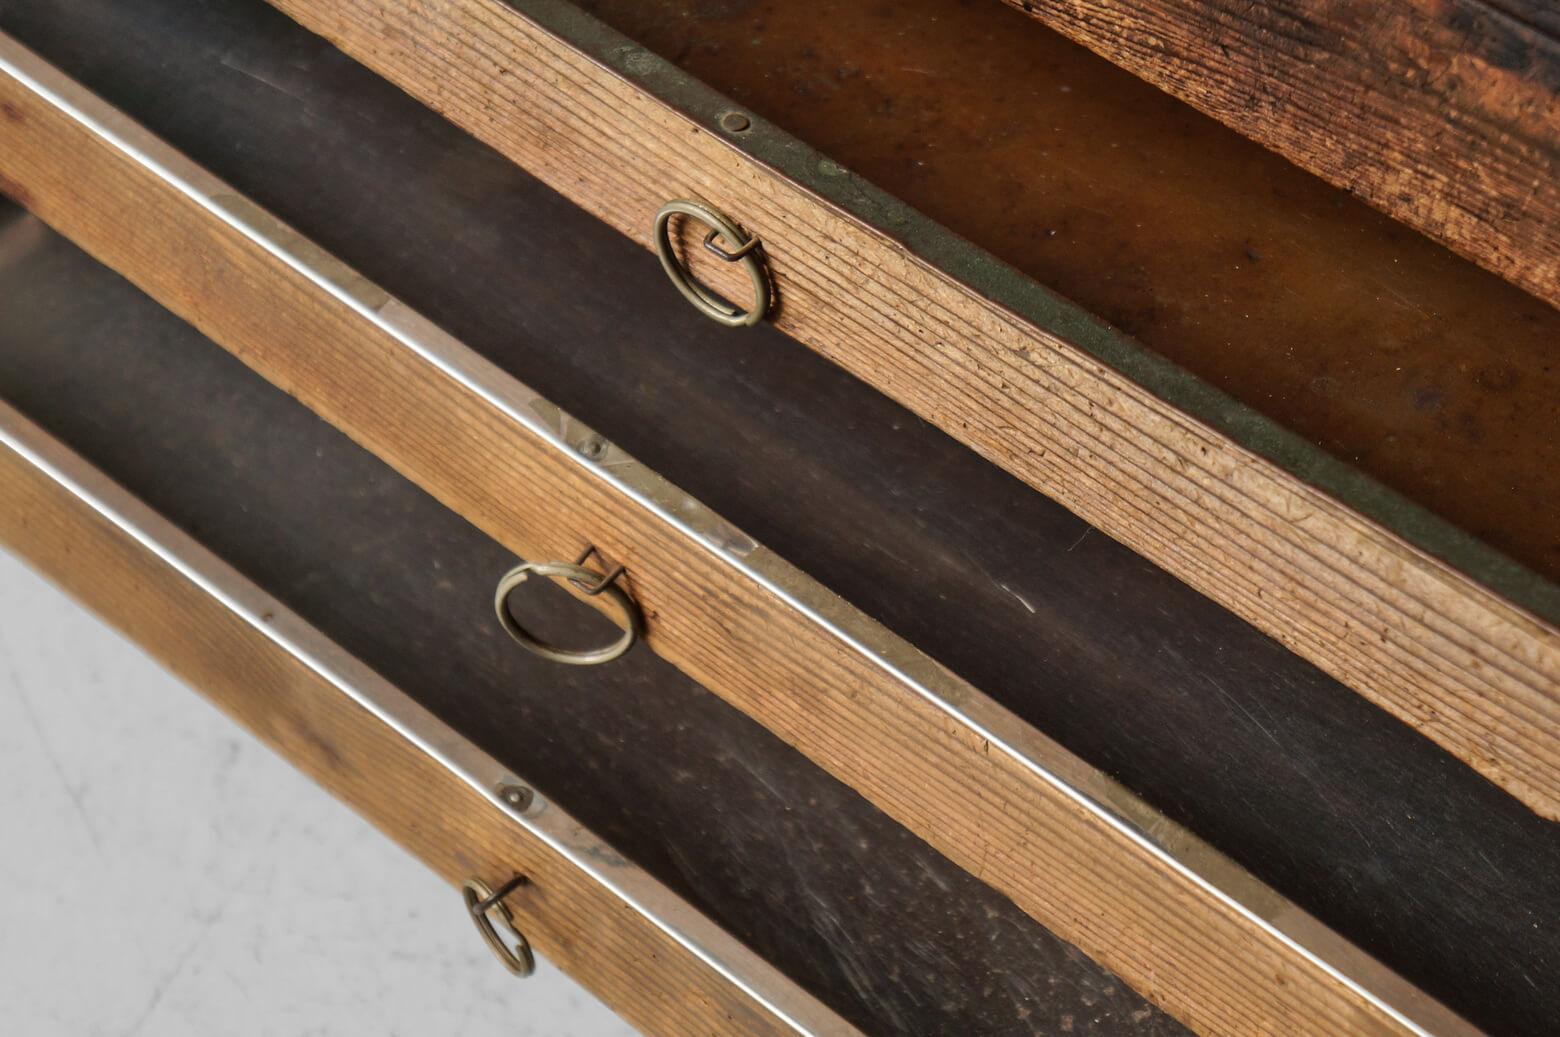 Engraving Work Desk/彫金机 袖なし 作業台 レトロ テーブル